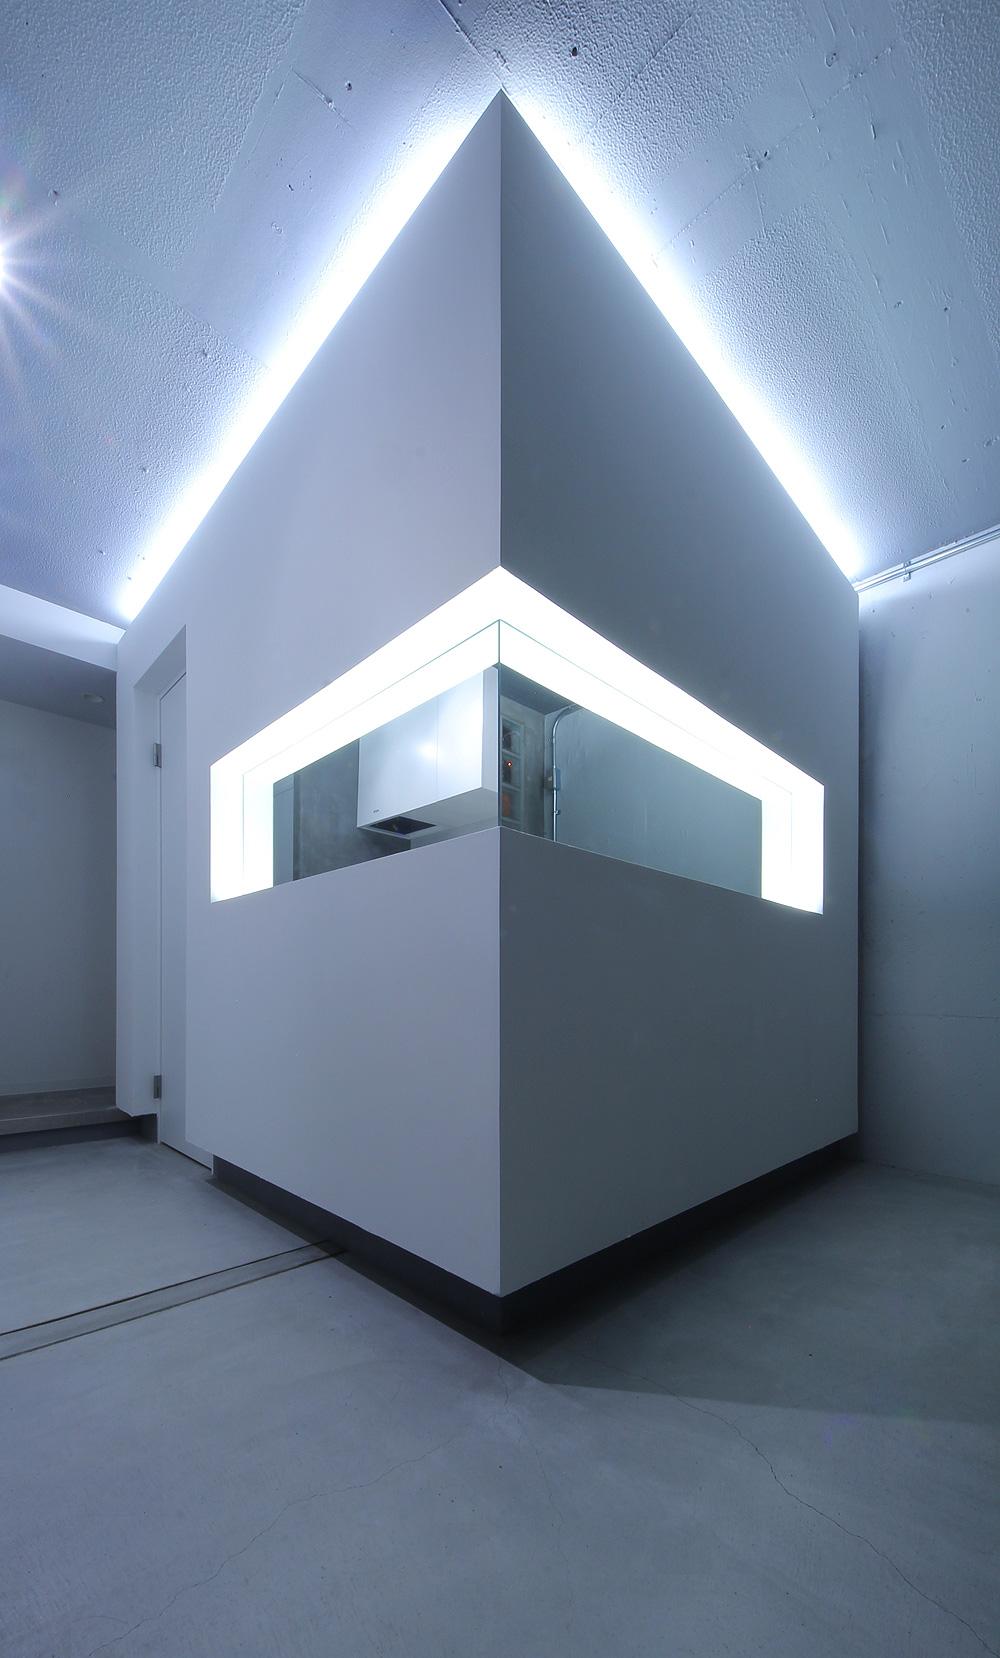 vivienda y galeria de arte jun murata (3)